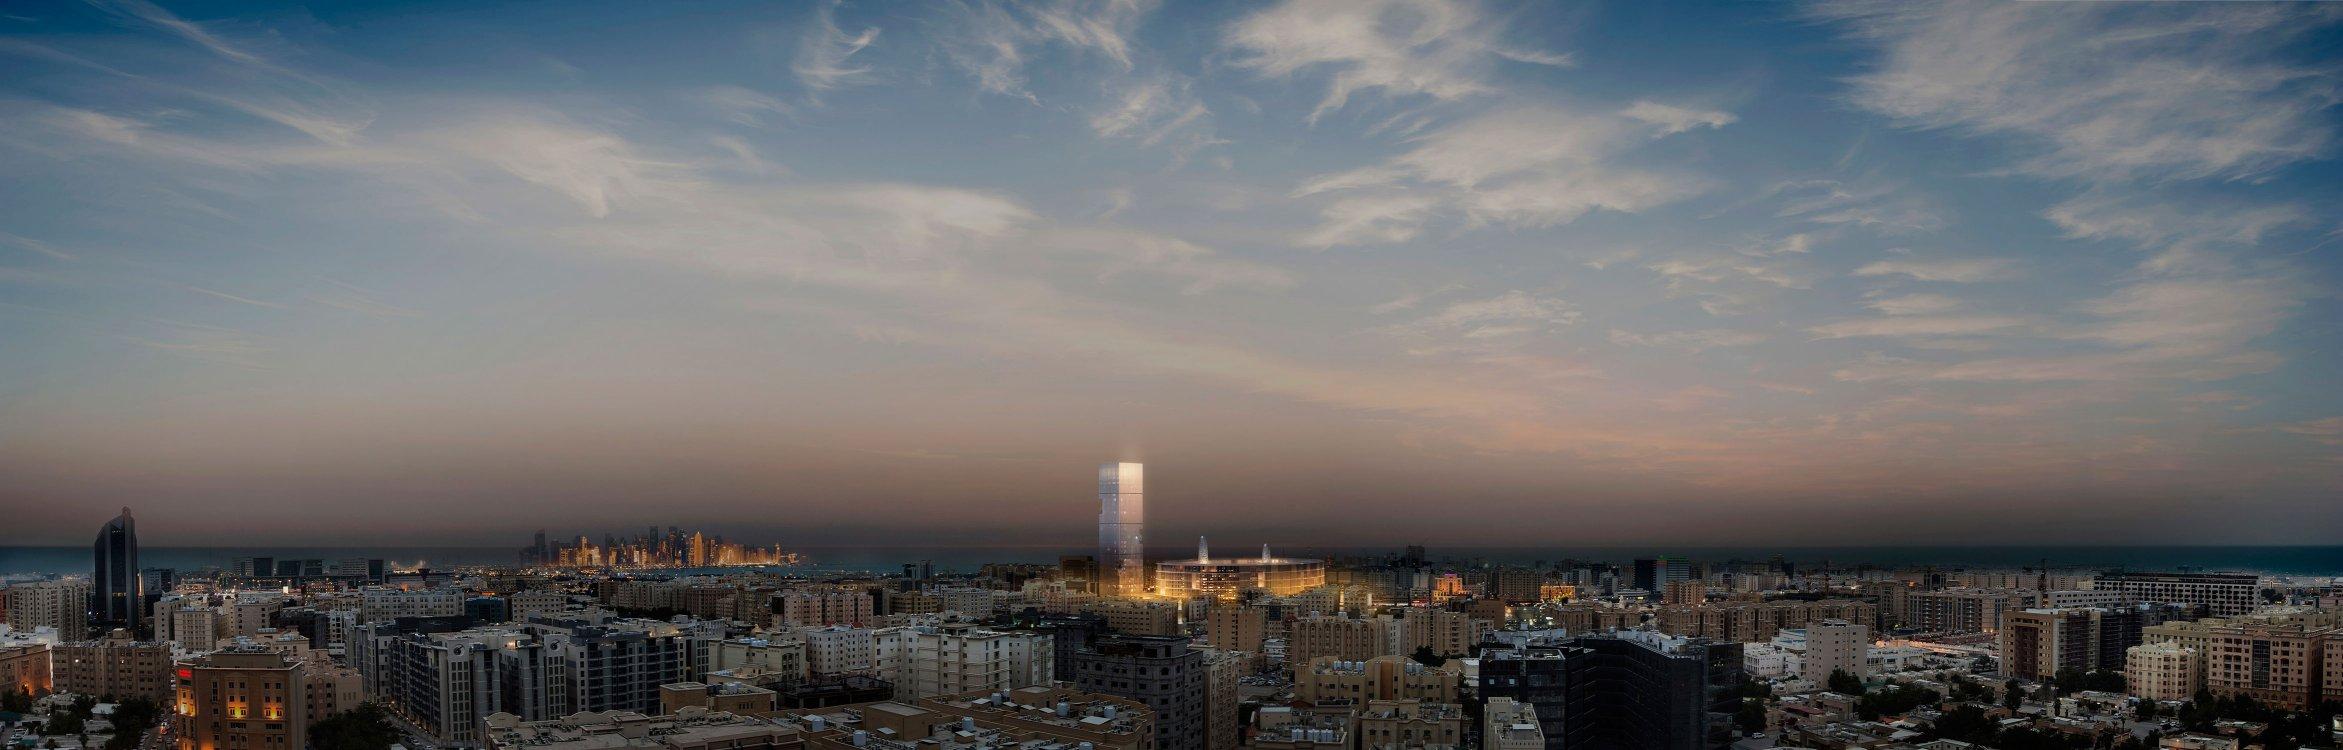 doha oasis - 2011 | nabil gholam architects